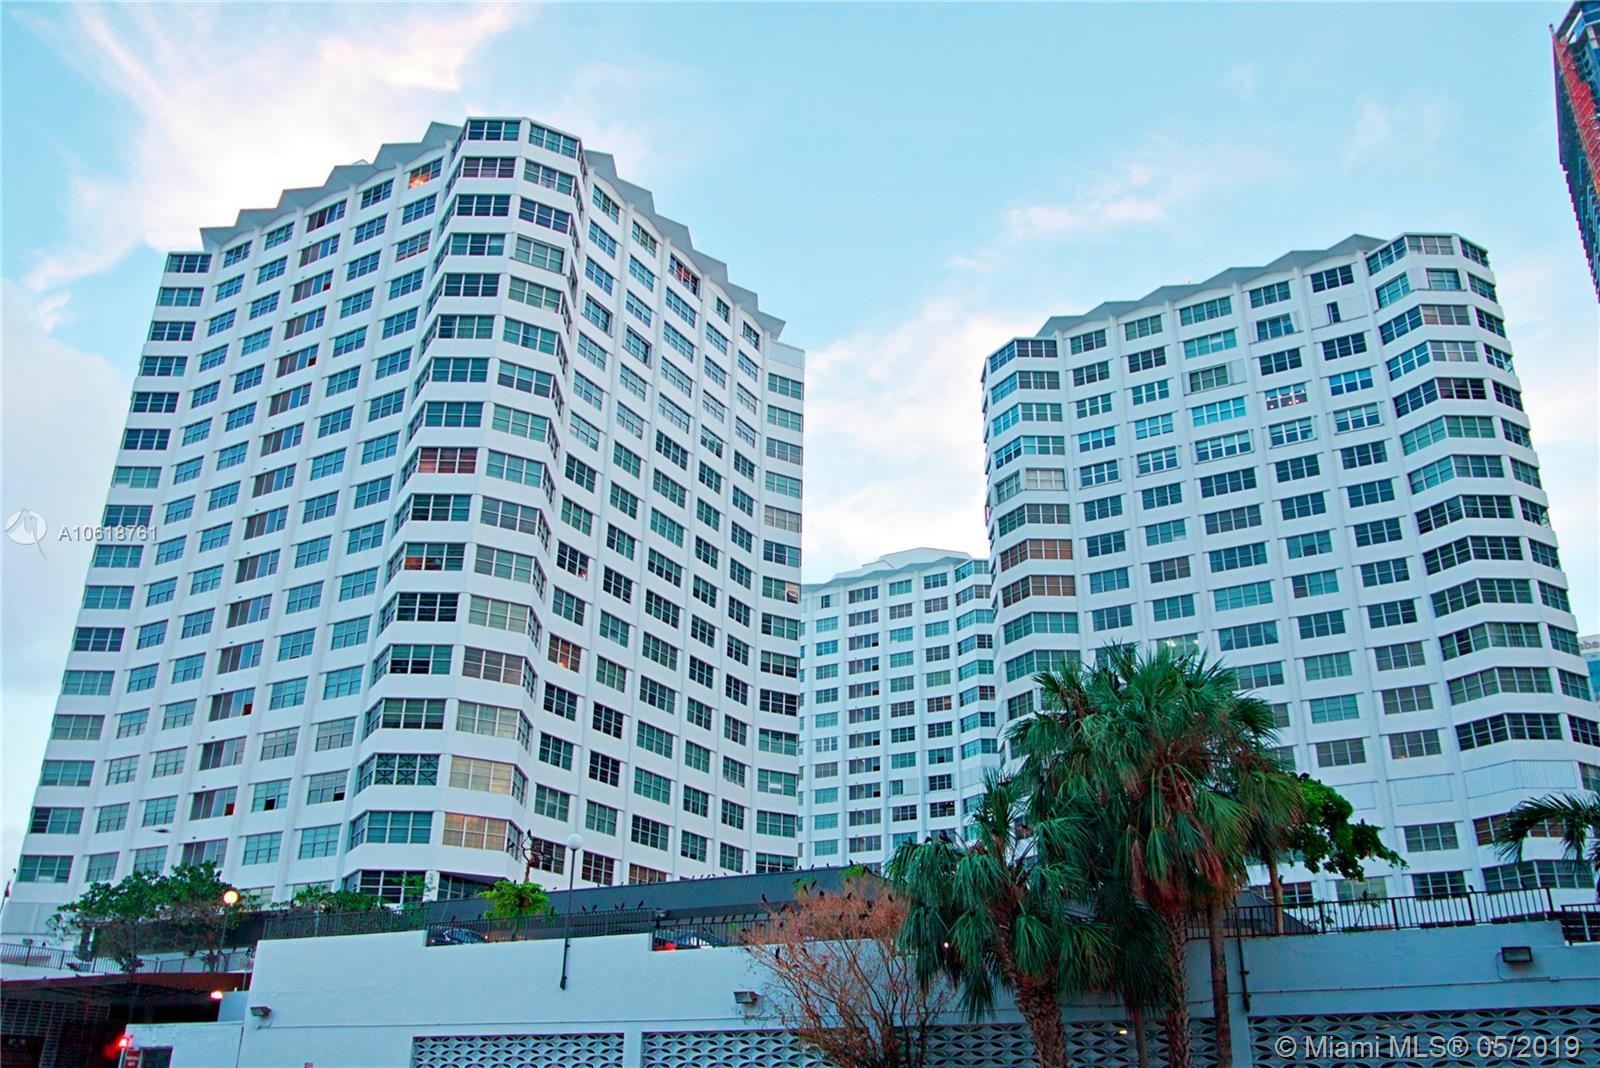 905 Brickell Bay Drive, Miami, FL 33131, Four Ambassadors #845, Brickell, Miami A10618761 image #1